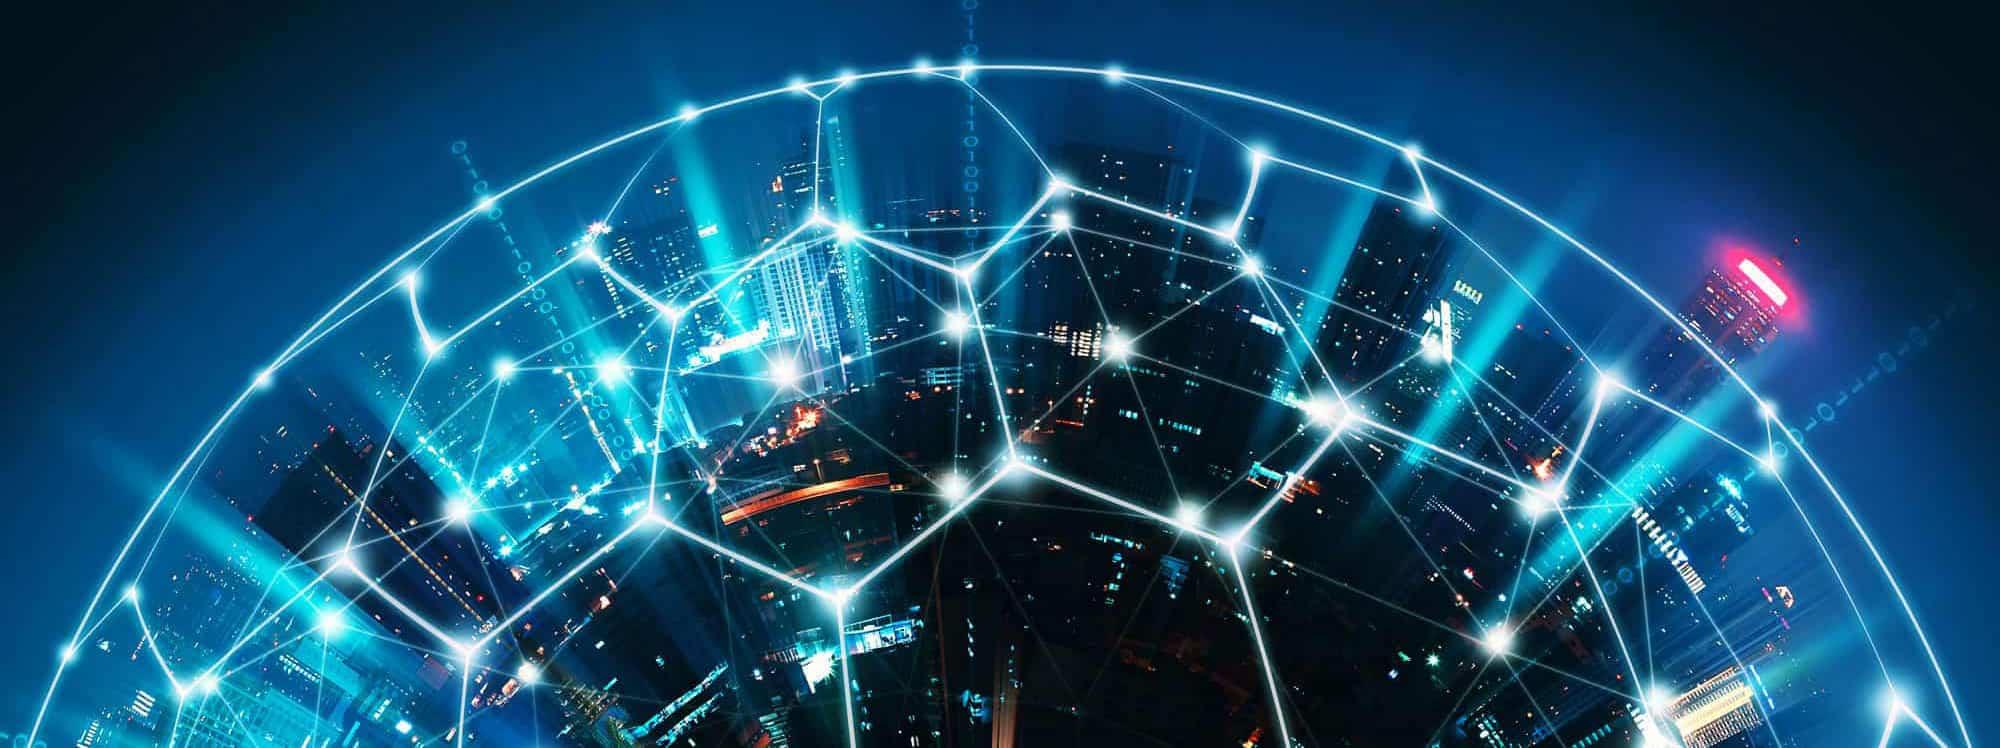 Hybrid SEO Digital Marketing Services